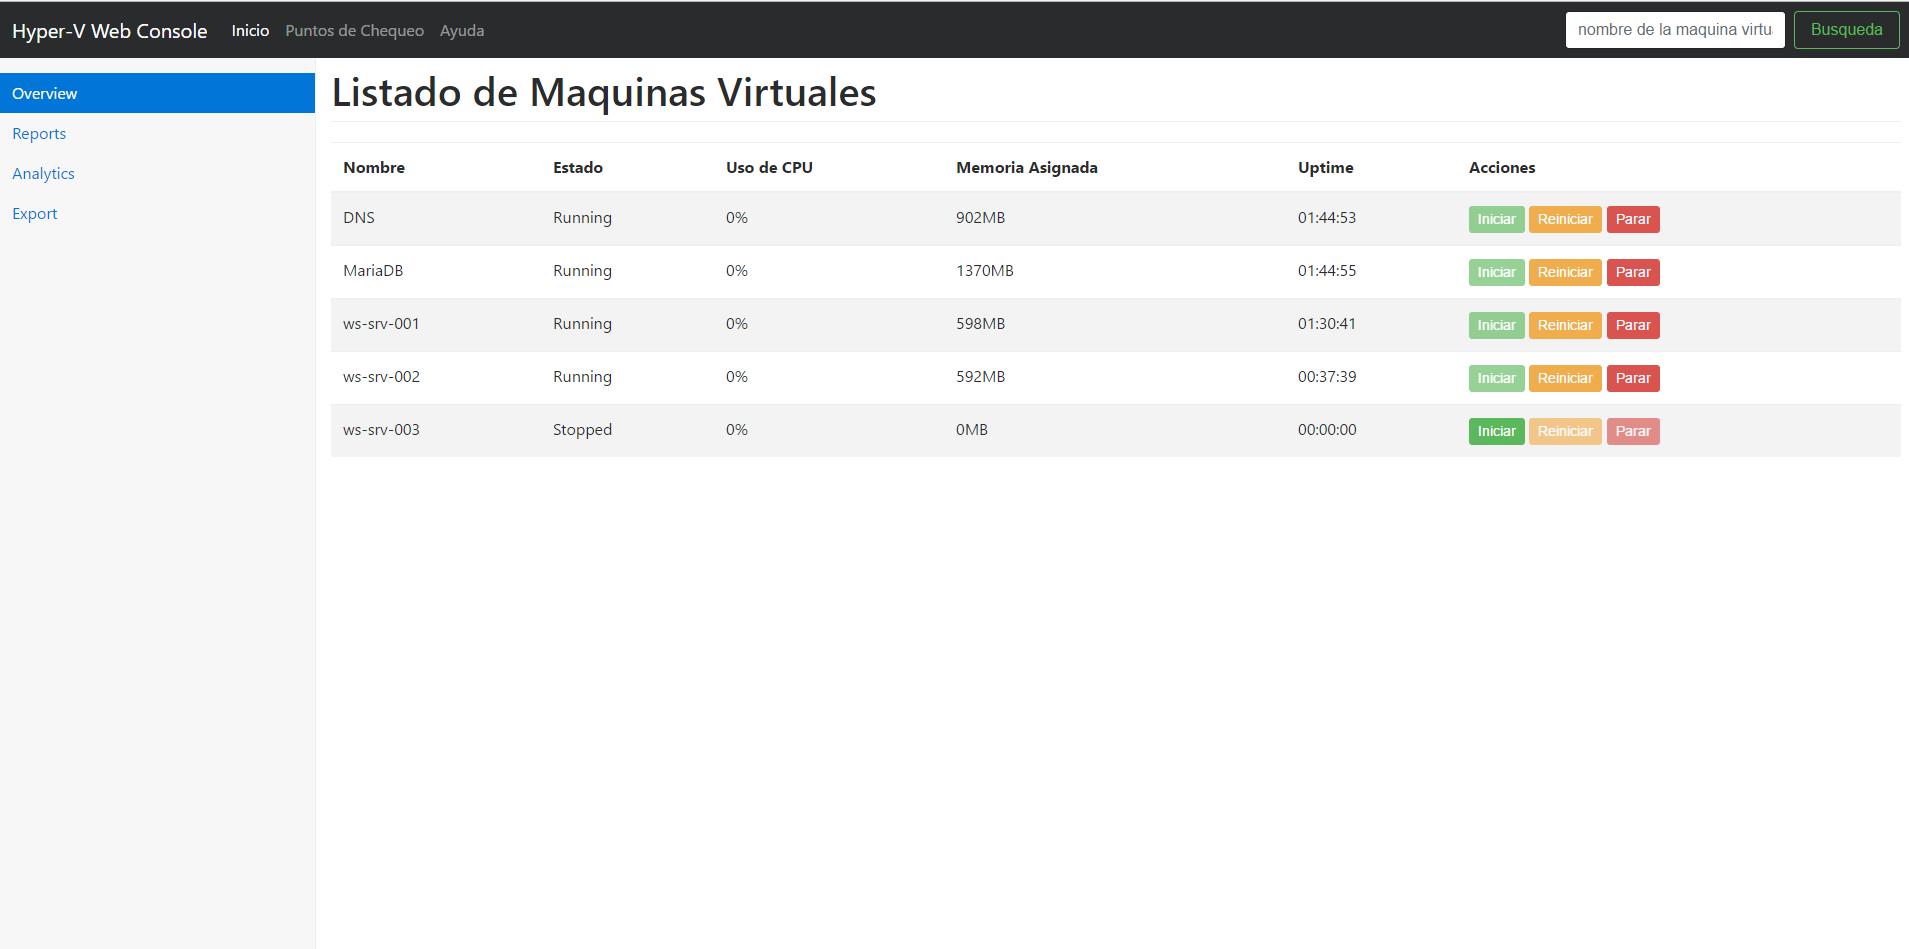 Hyper-V-Web-Console Screenshot